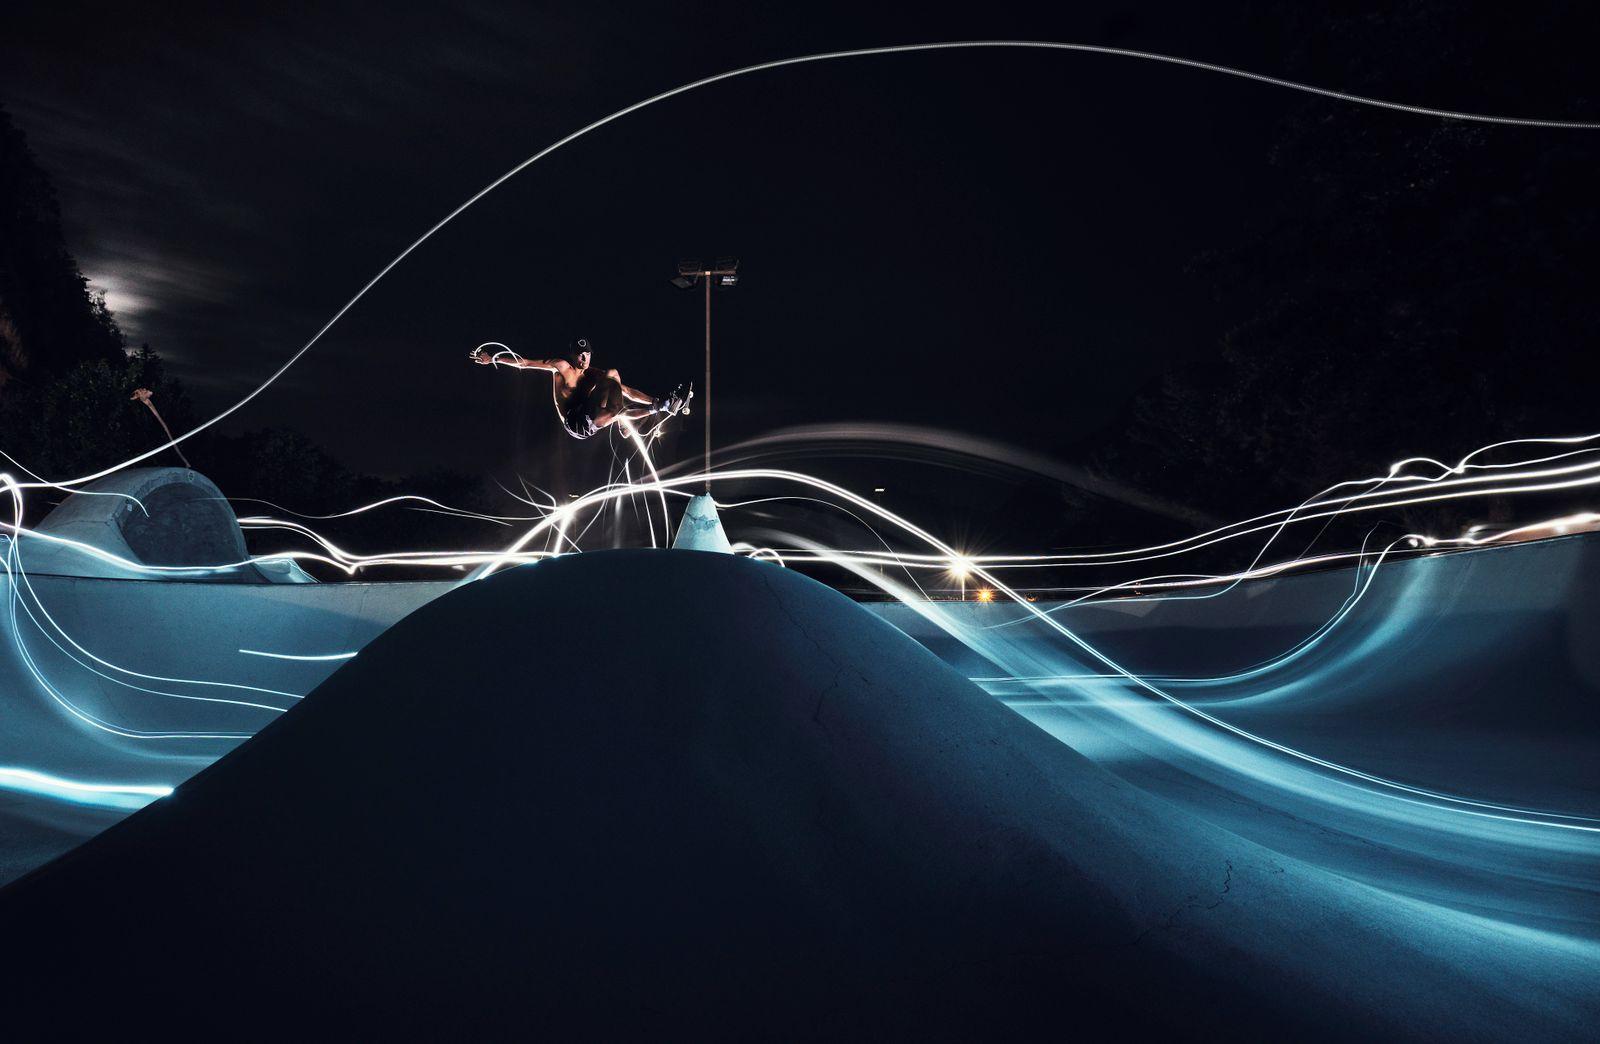 *** YEAR IN REVIEW - SPORT *** Olympic Skateboard Qualifier Tyler Edtmayer Trains In Austria